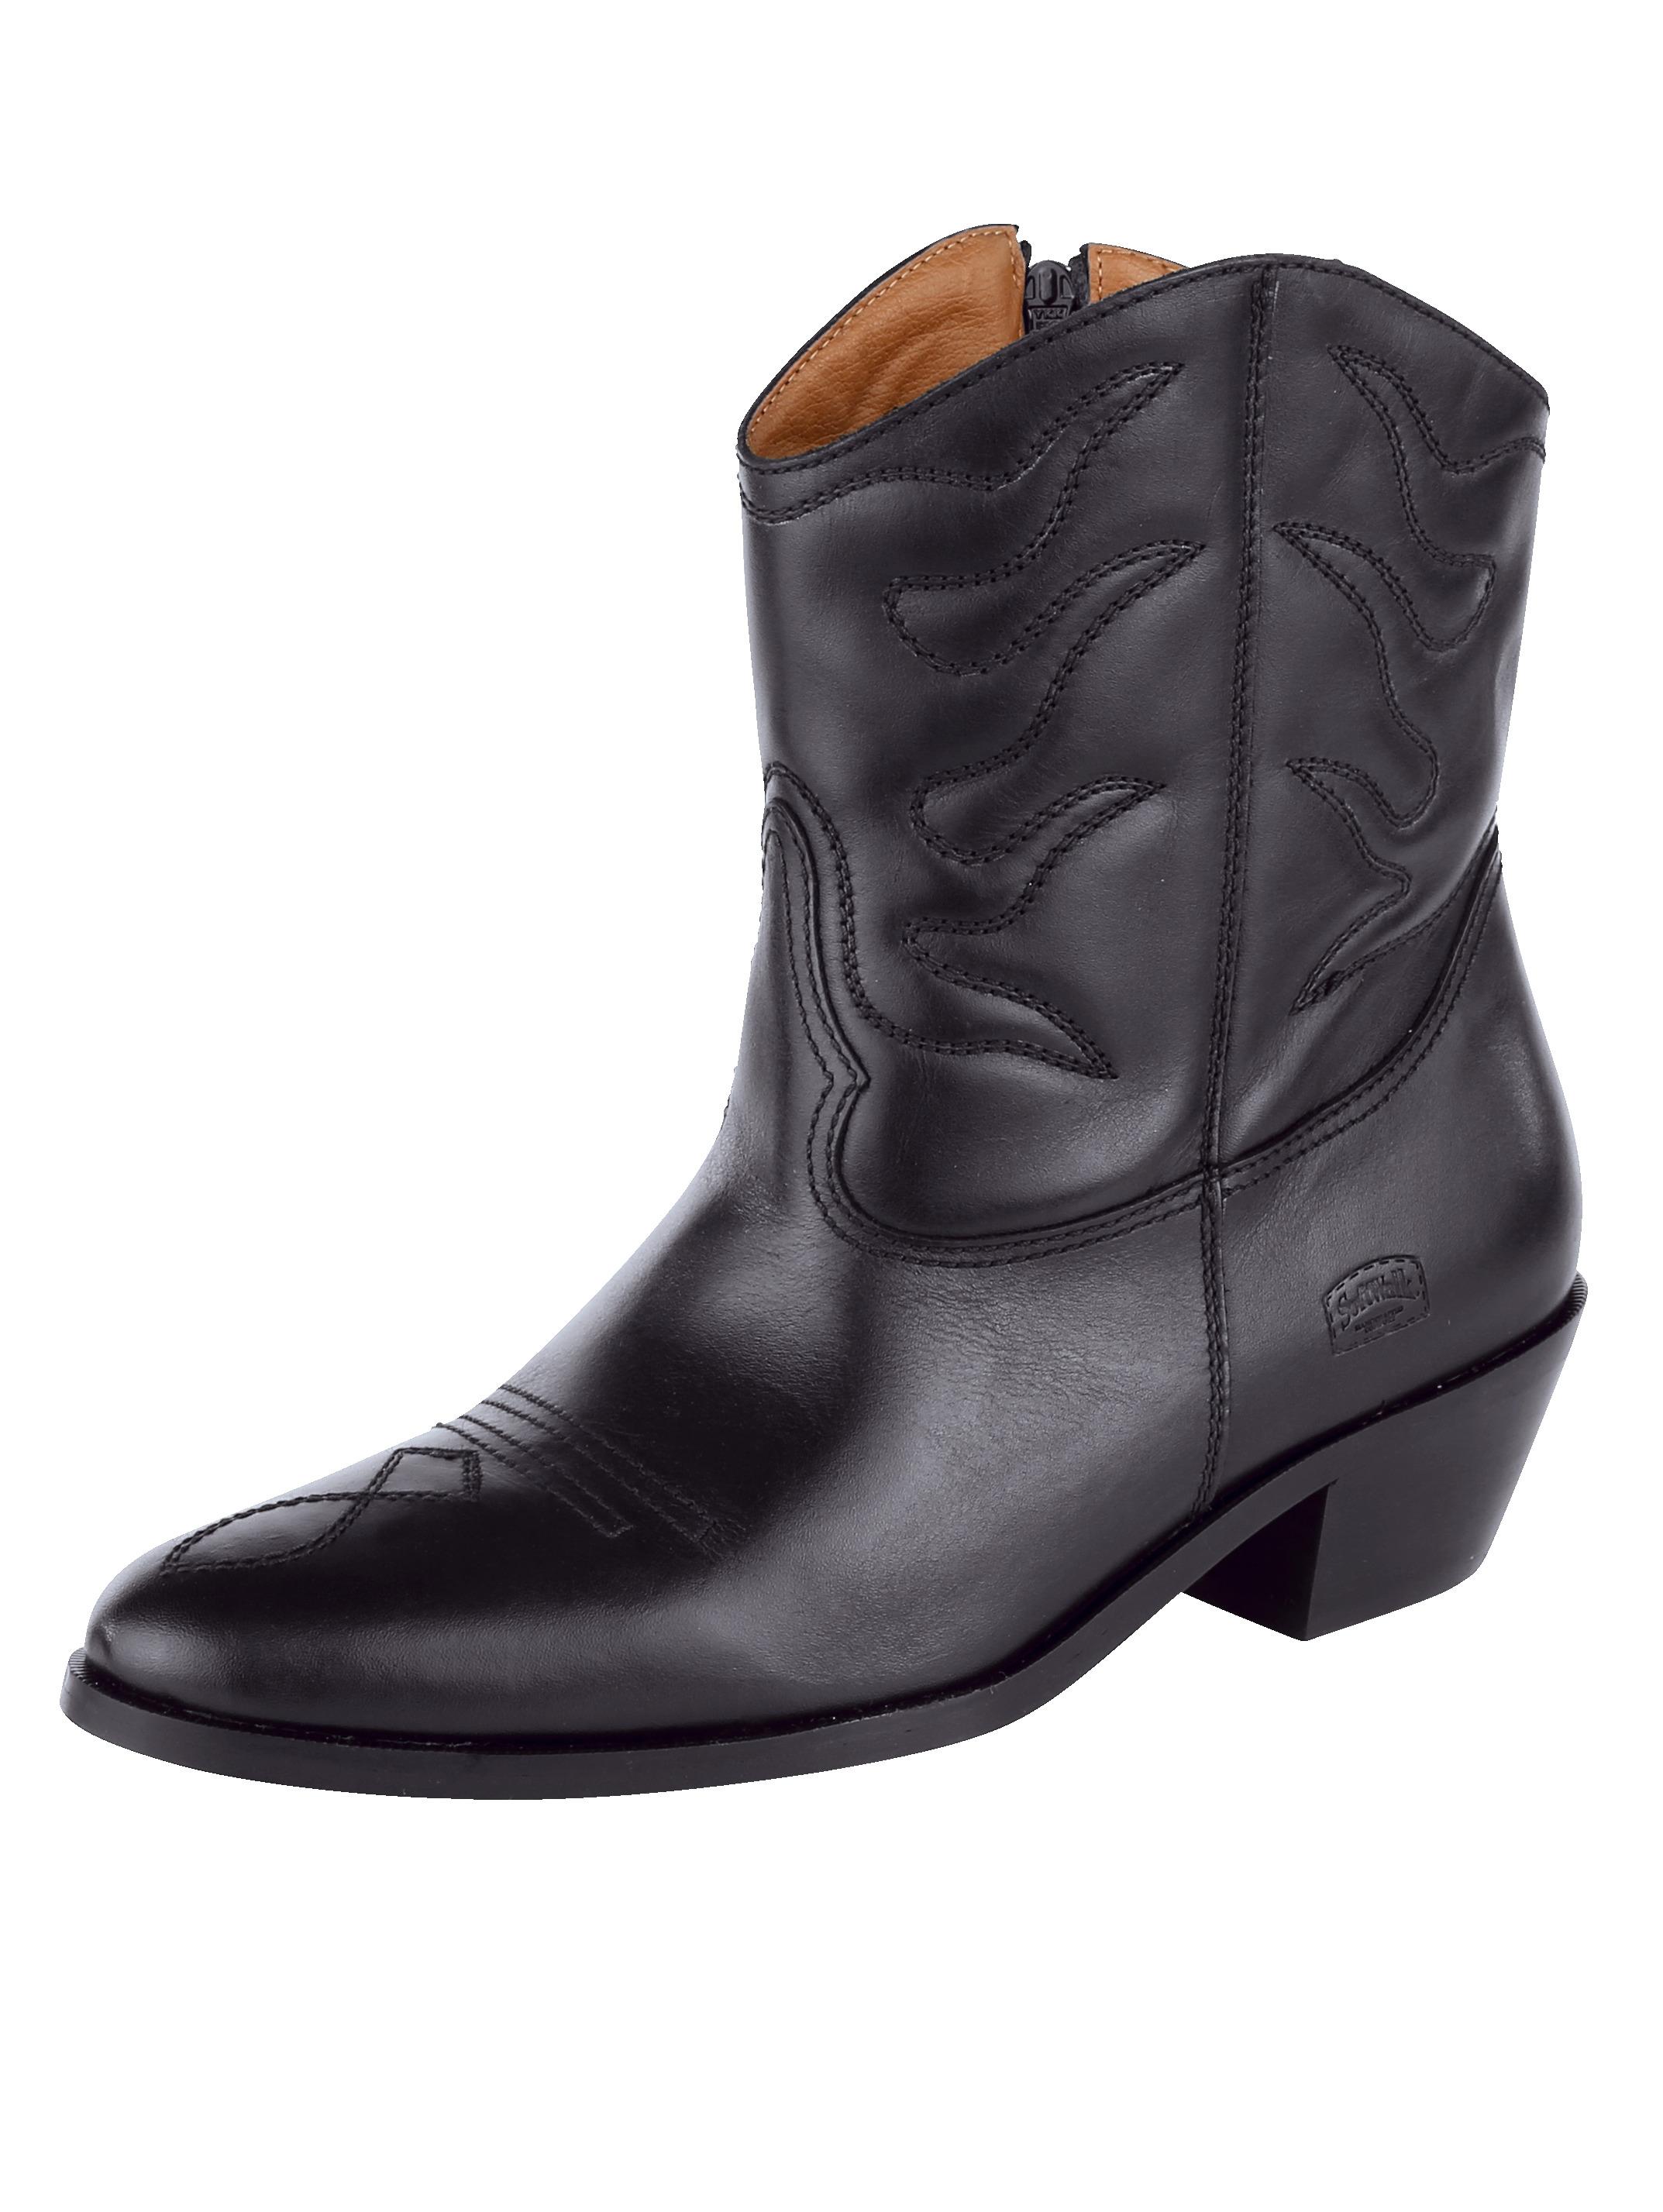 Westernové čižmičky Softwalk čierna - Glami.sk 8c261d81b75